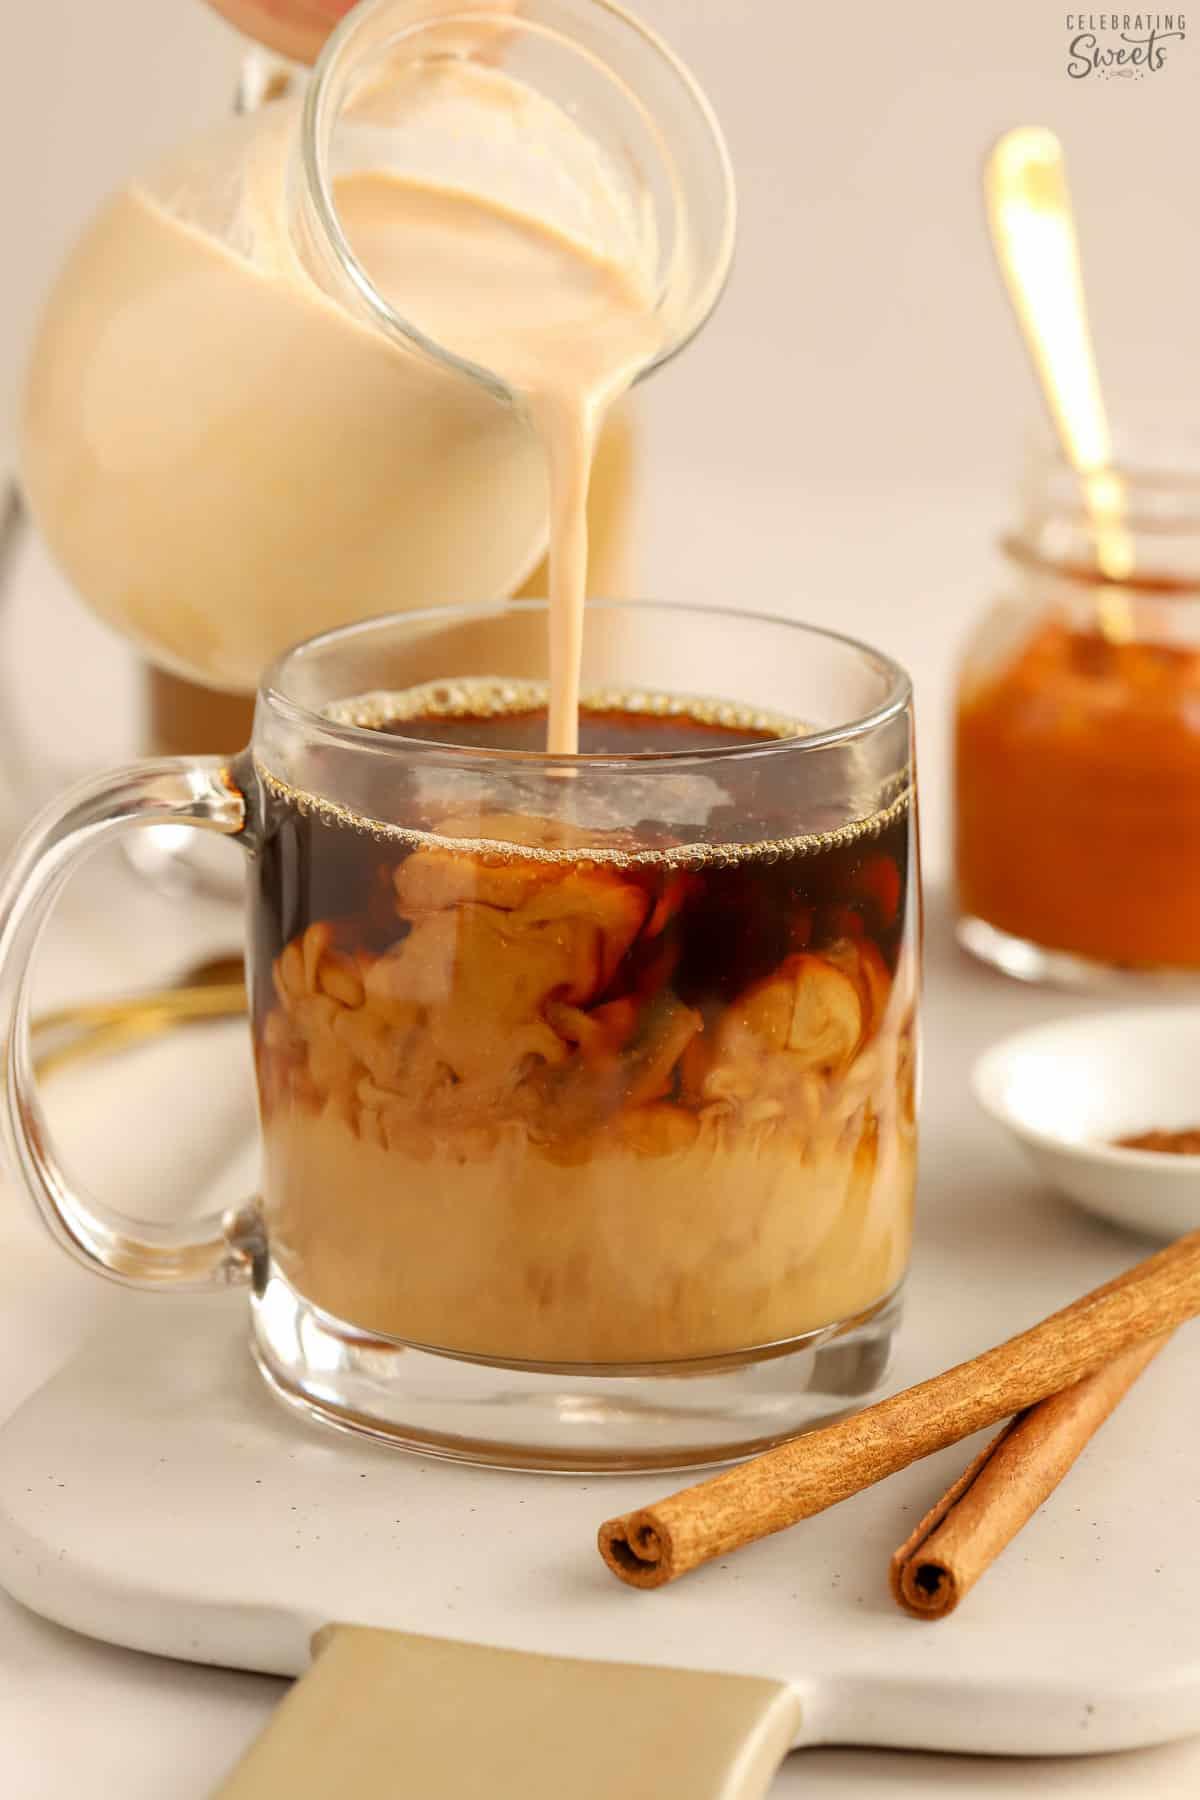 Pumpkin spice creamer being poured into a mug of black coffee.